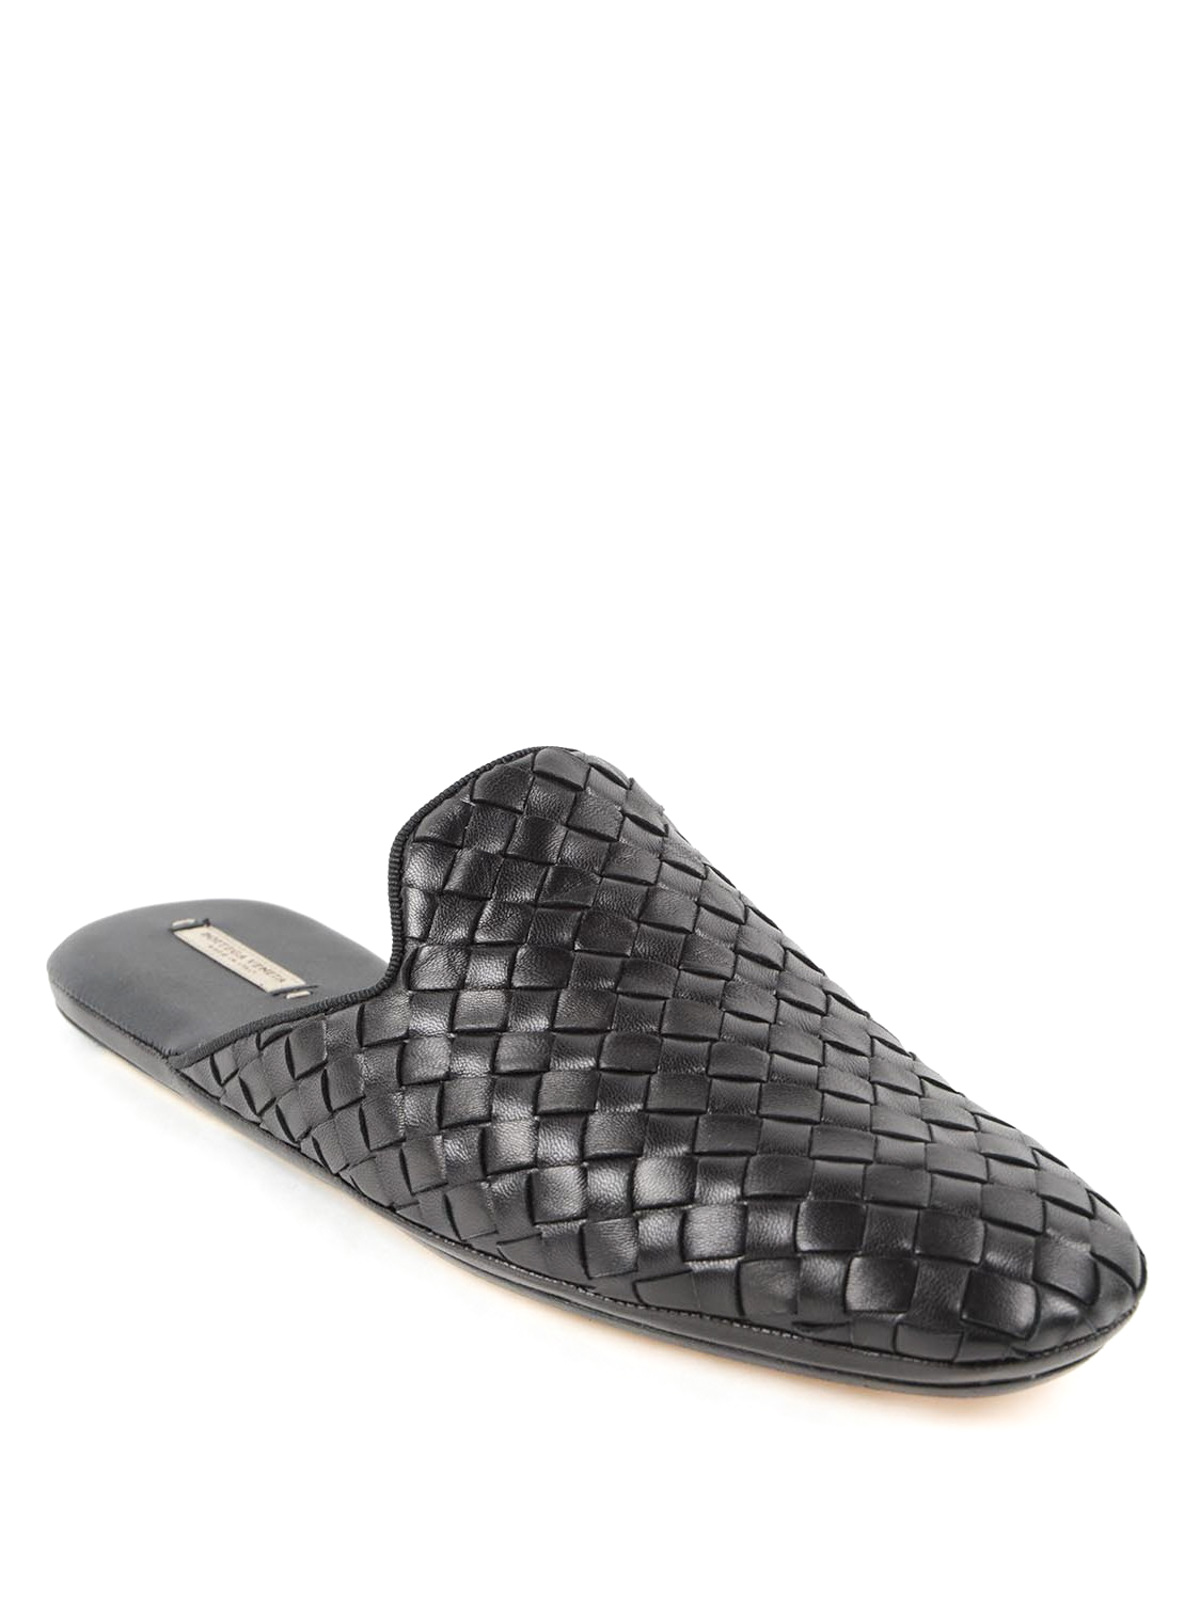 6f936121868 BOTTEGA VENETA  Loafers   Slippers online - Fiandra Intrecciato nappa  slippers